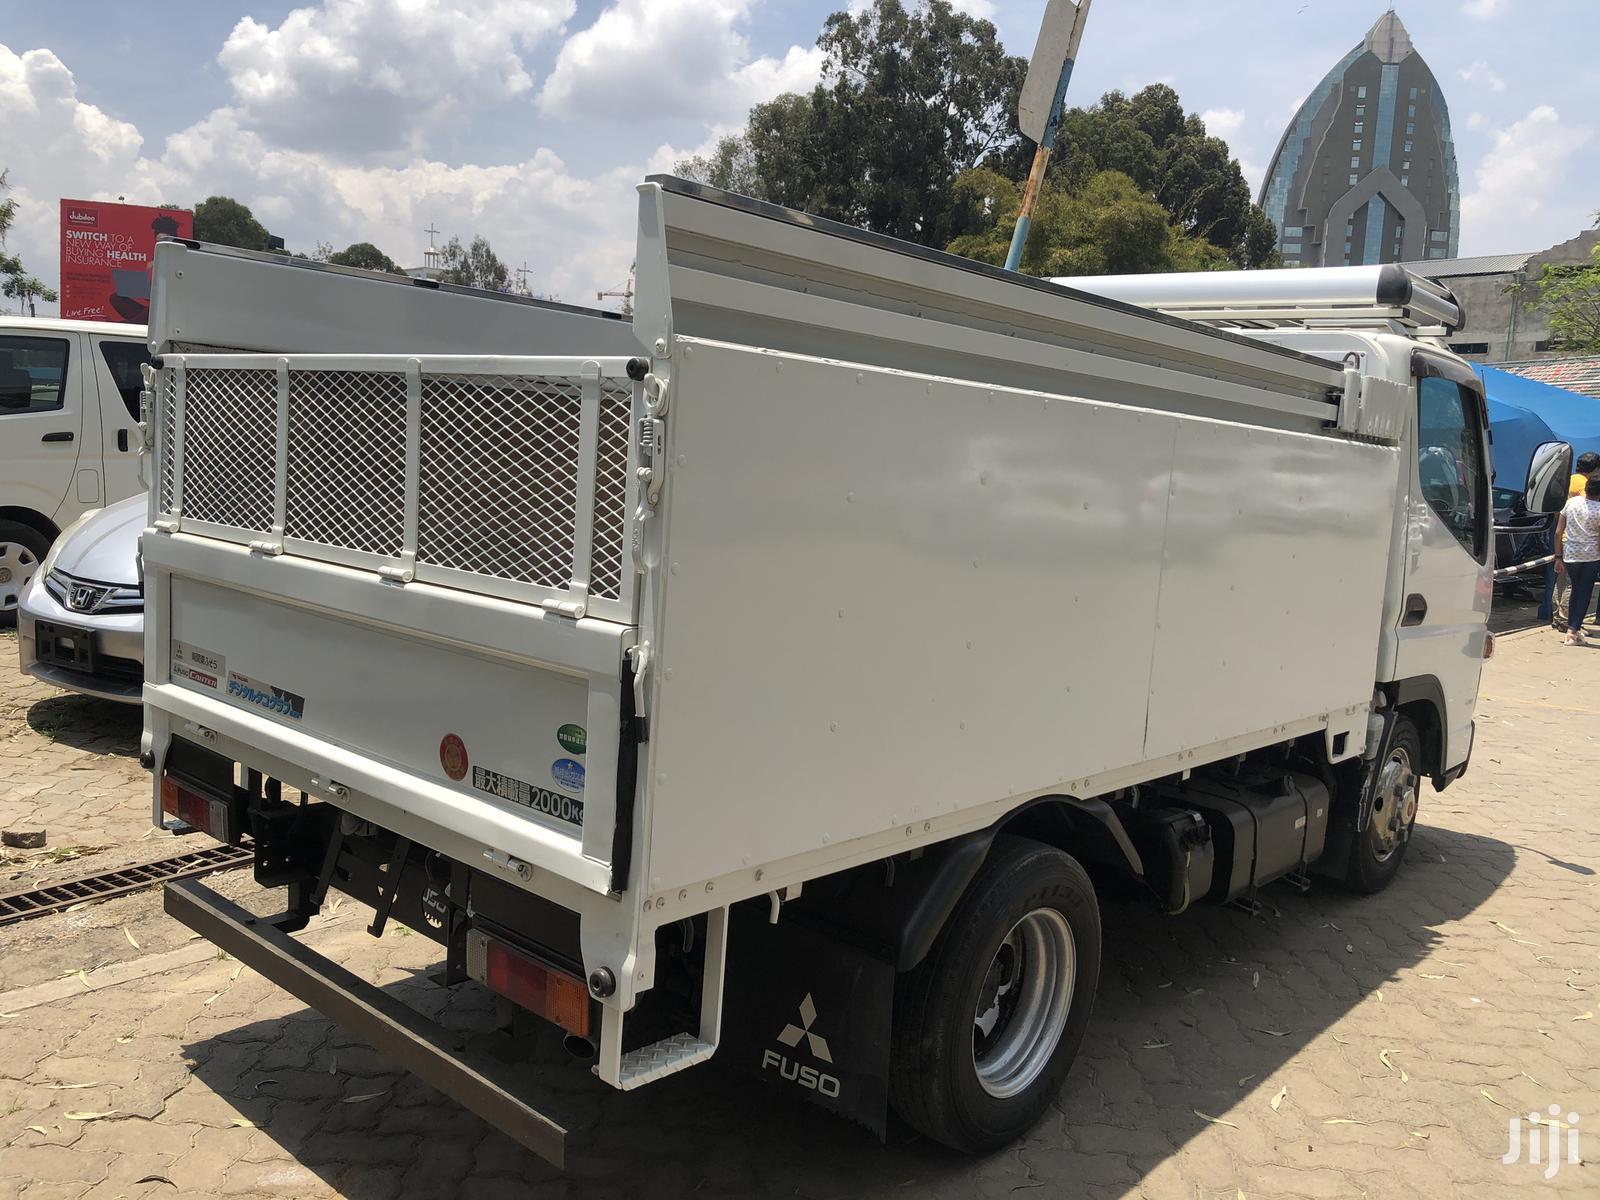 2014 Mitsubishi Canter 3,000cc DIESEL | Trucks & Trailers for sale in Kilimani, Nairobi, Kenya